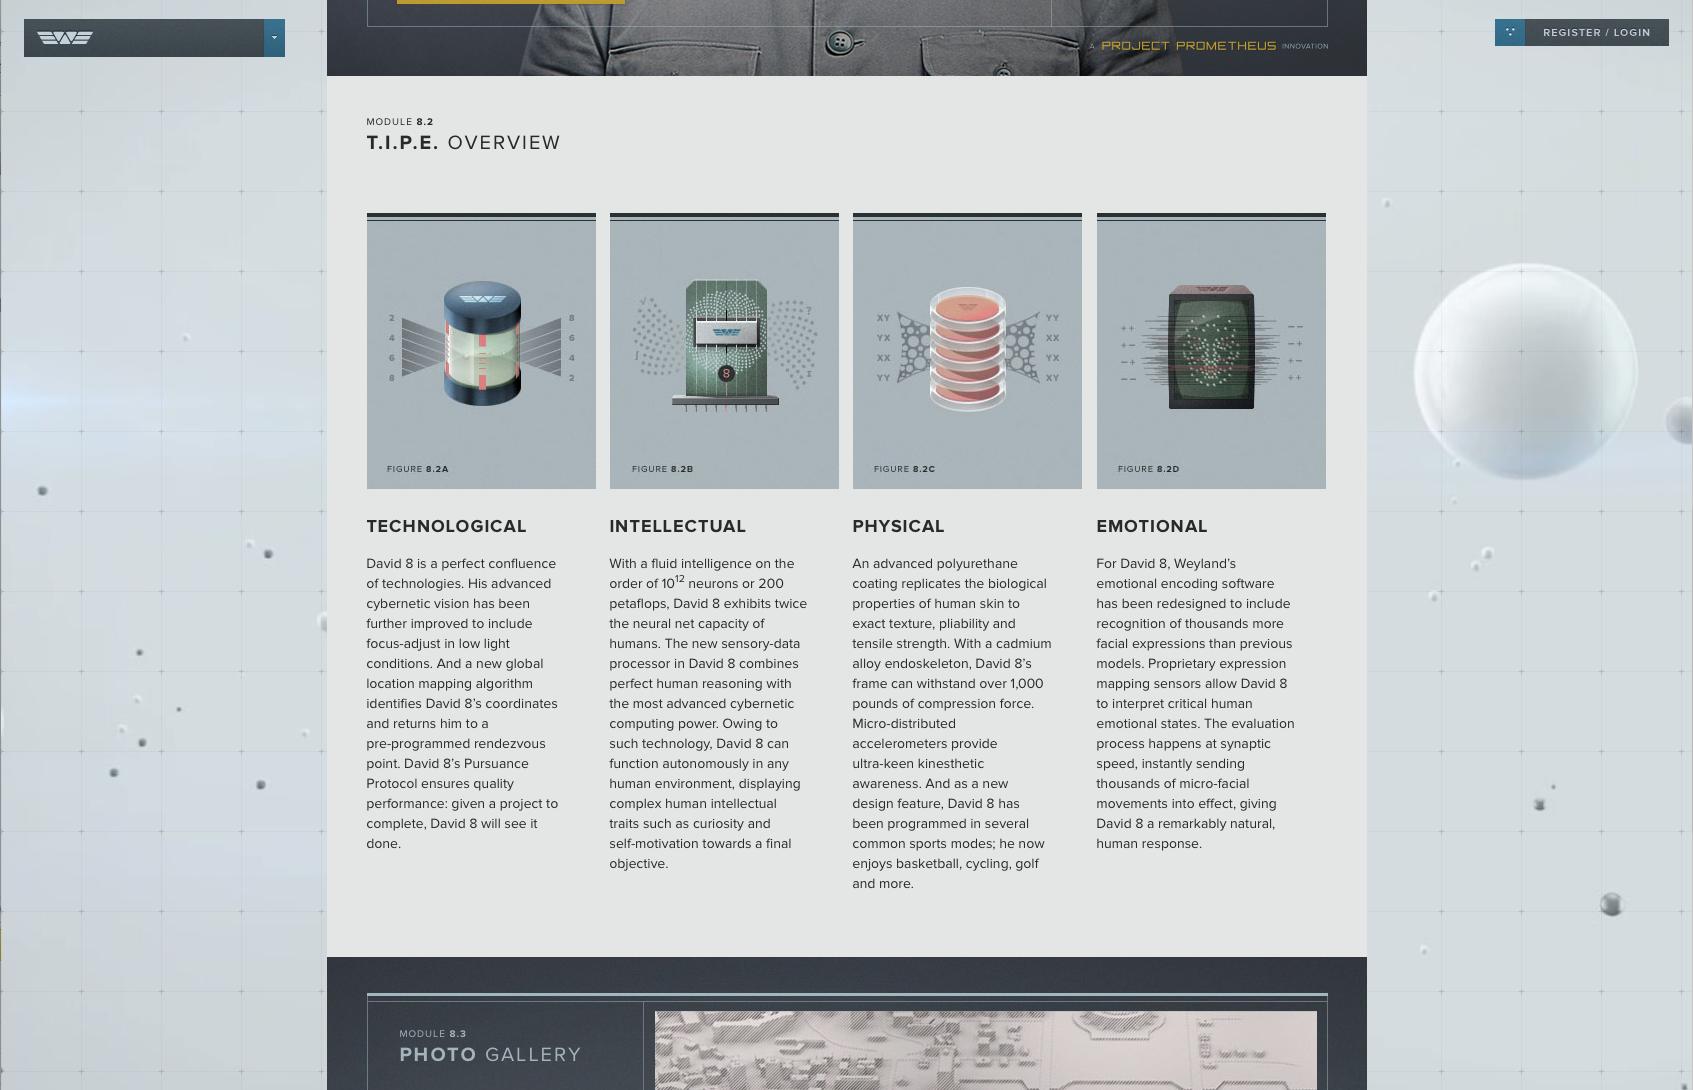 Weyland Industries Prometheus Website Infographic Emotions Photo